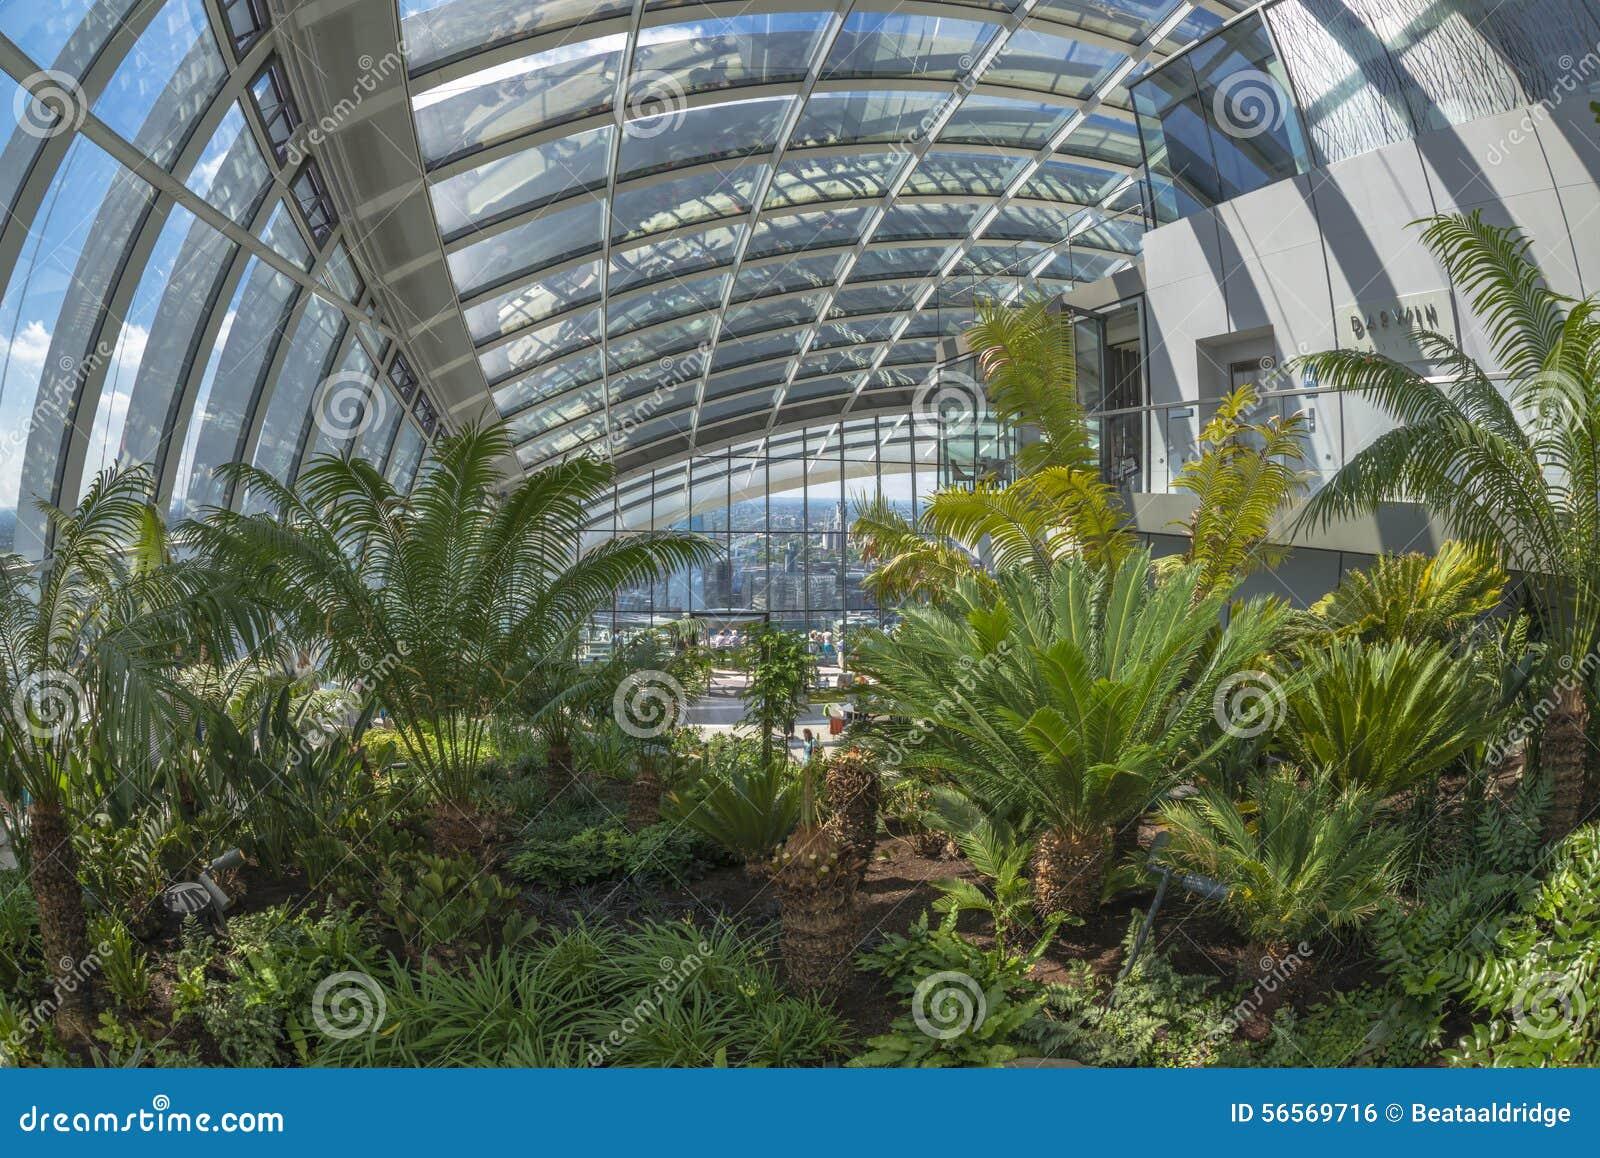 Download Ο κήπος ουρανού, οδός 20 Fenchurch, Λονδίνο, UK Εκδοτική Εικόνες - εικόνα από θέση, αρχιτεκτονικής: 56569716